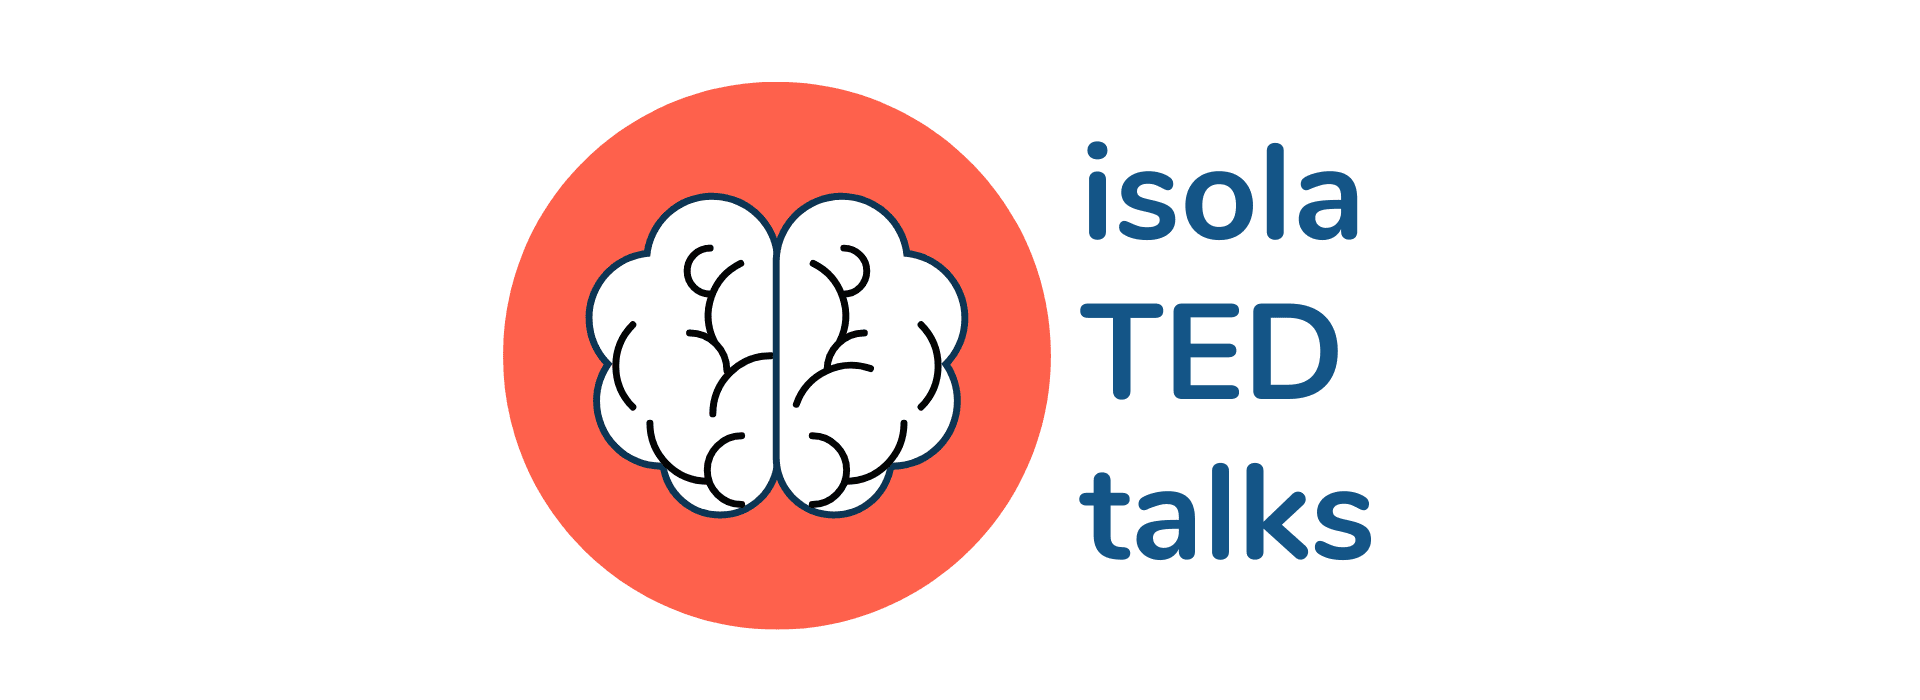 IsolaTED talks (3)